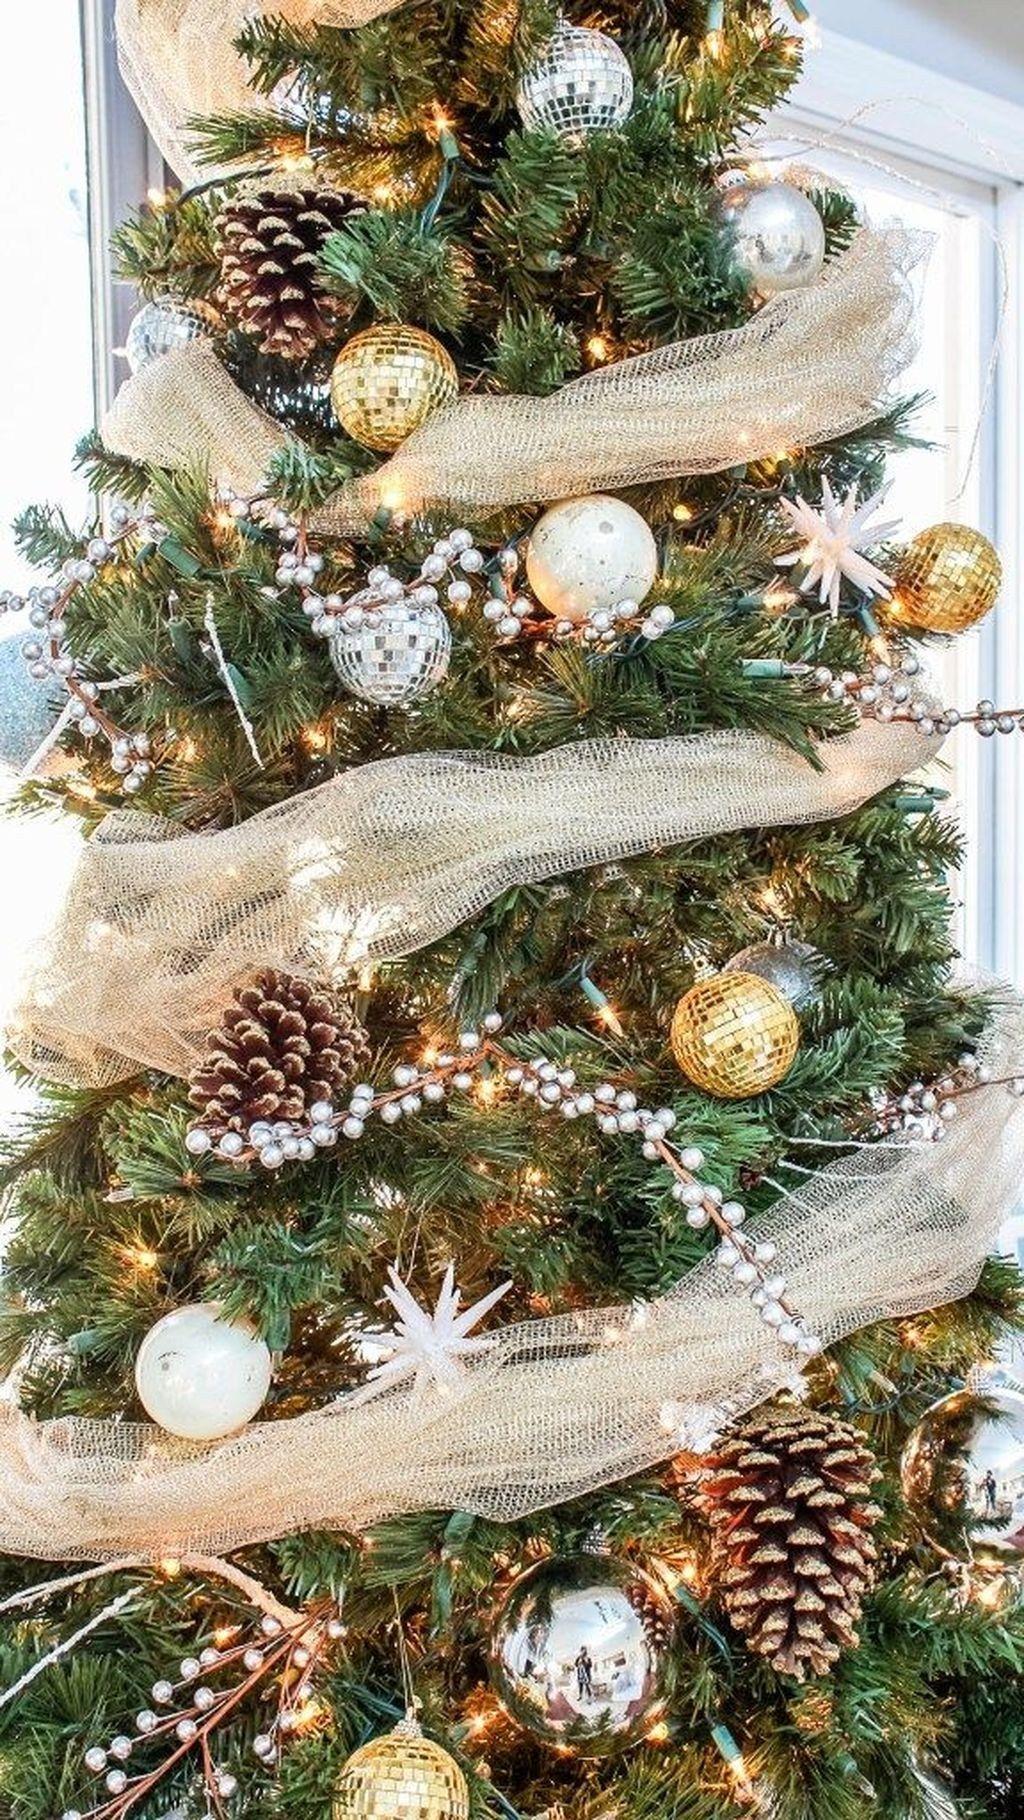 Elegant Rustic Christmas Decoration Ideas That Stands Out 23 Glam Christmas Tree Elegant Christmas Trees Christmas Decorations Rustic